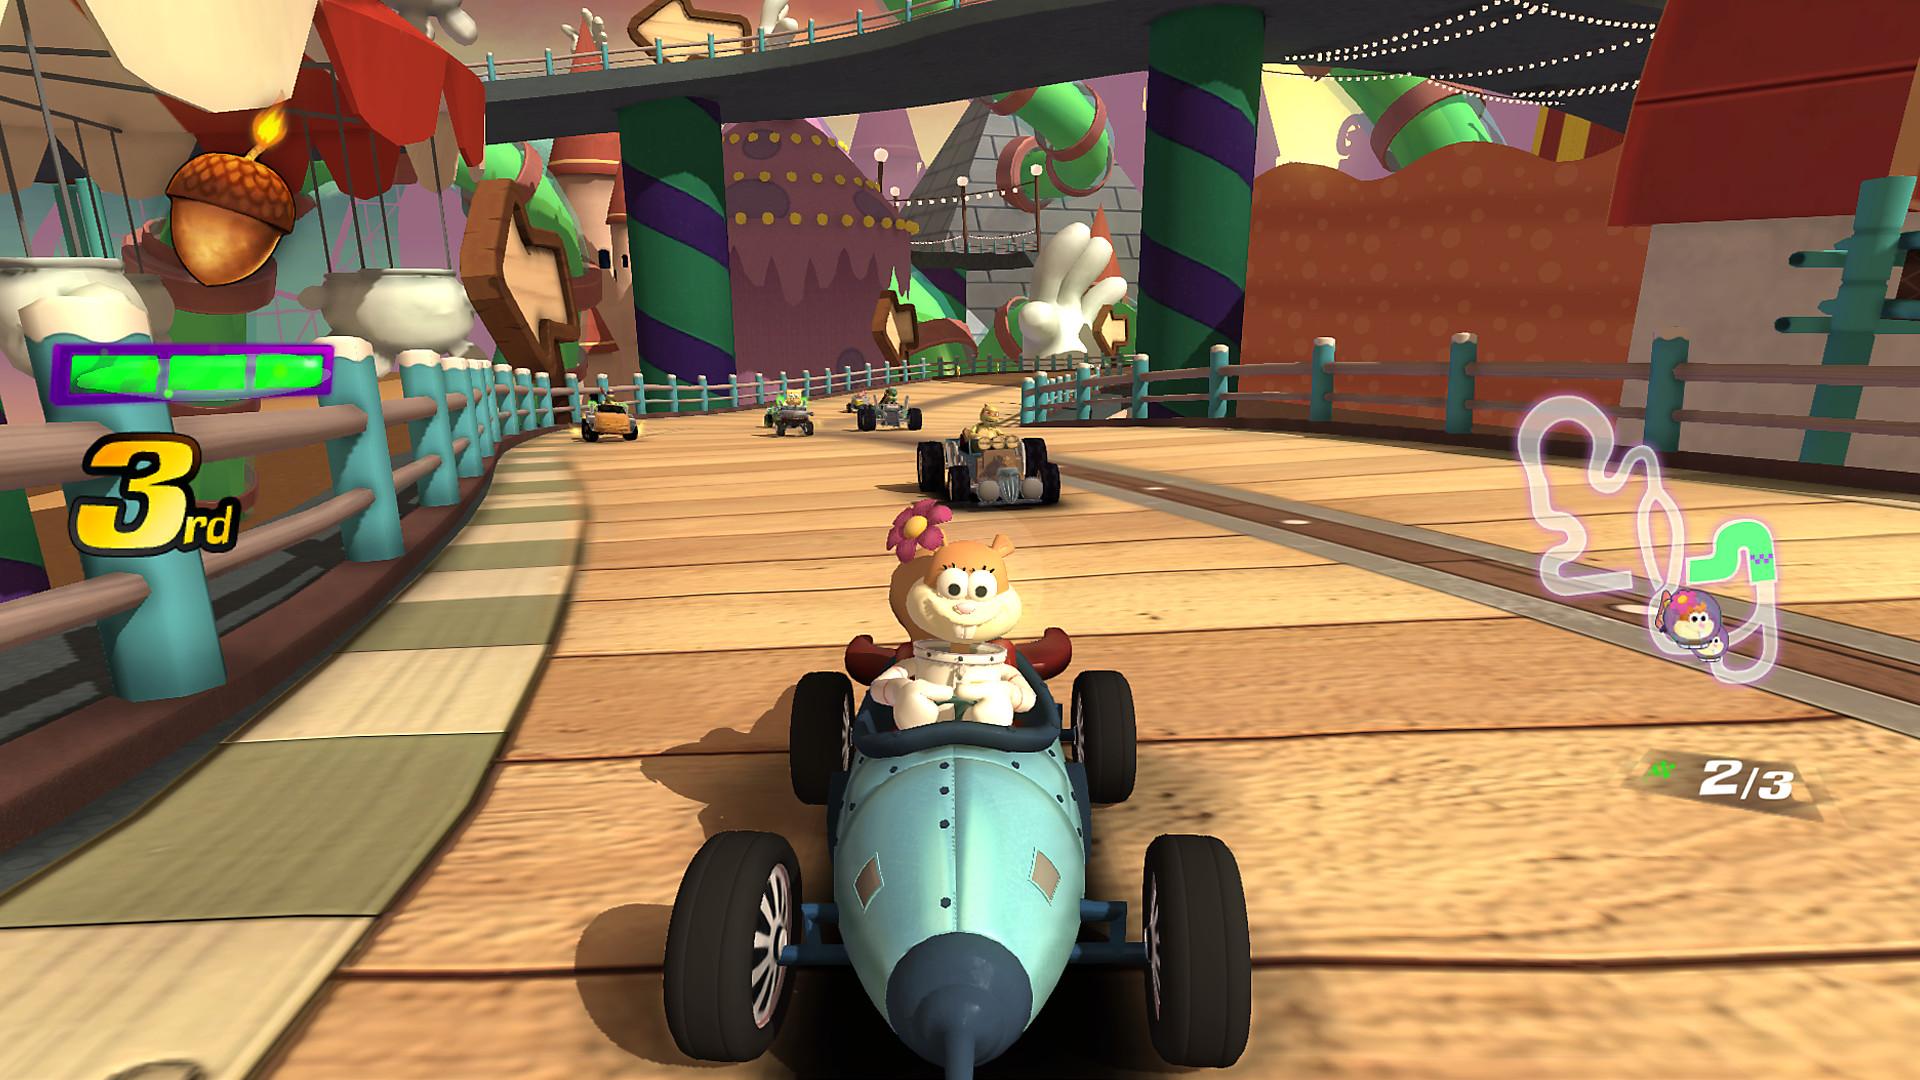 Nickelodeon Kart Racers Game | PS4 - PlayStation